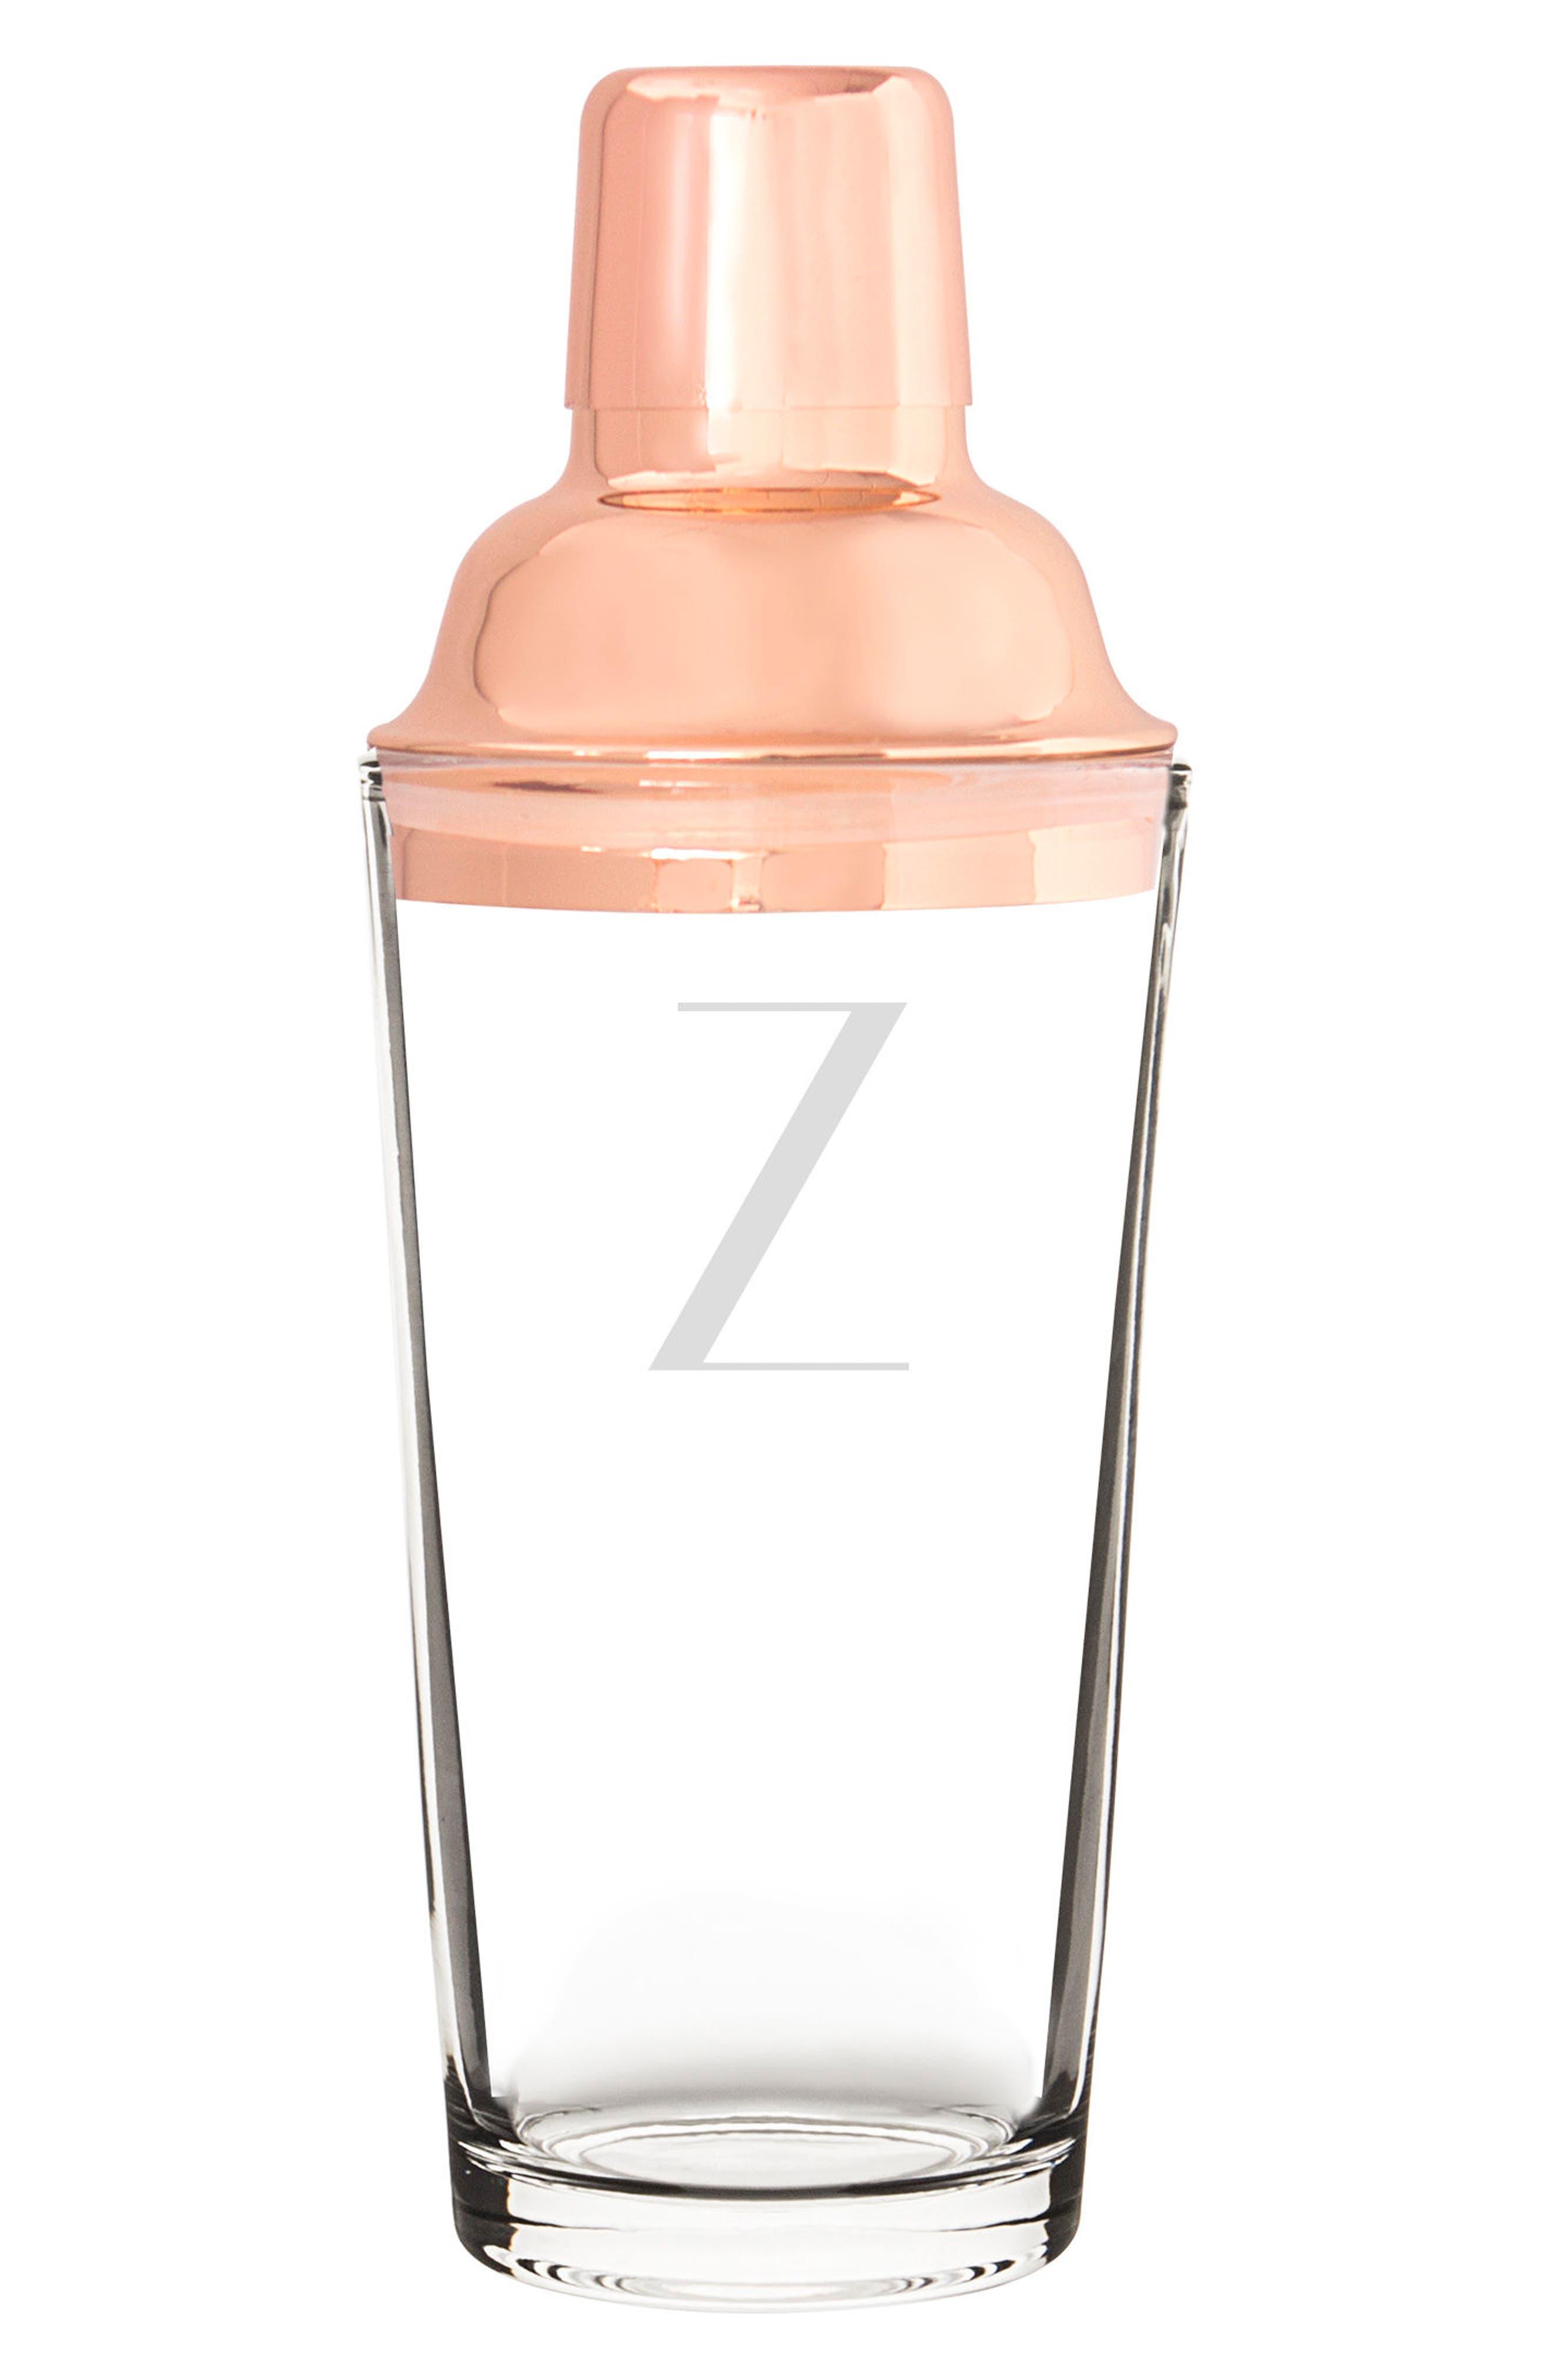 Monogram Coppertone Cocktail Shaker,                             Main thumbnail 27, color,